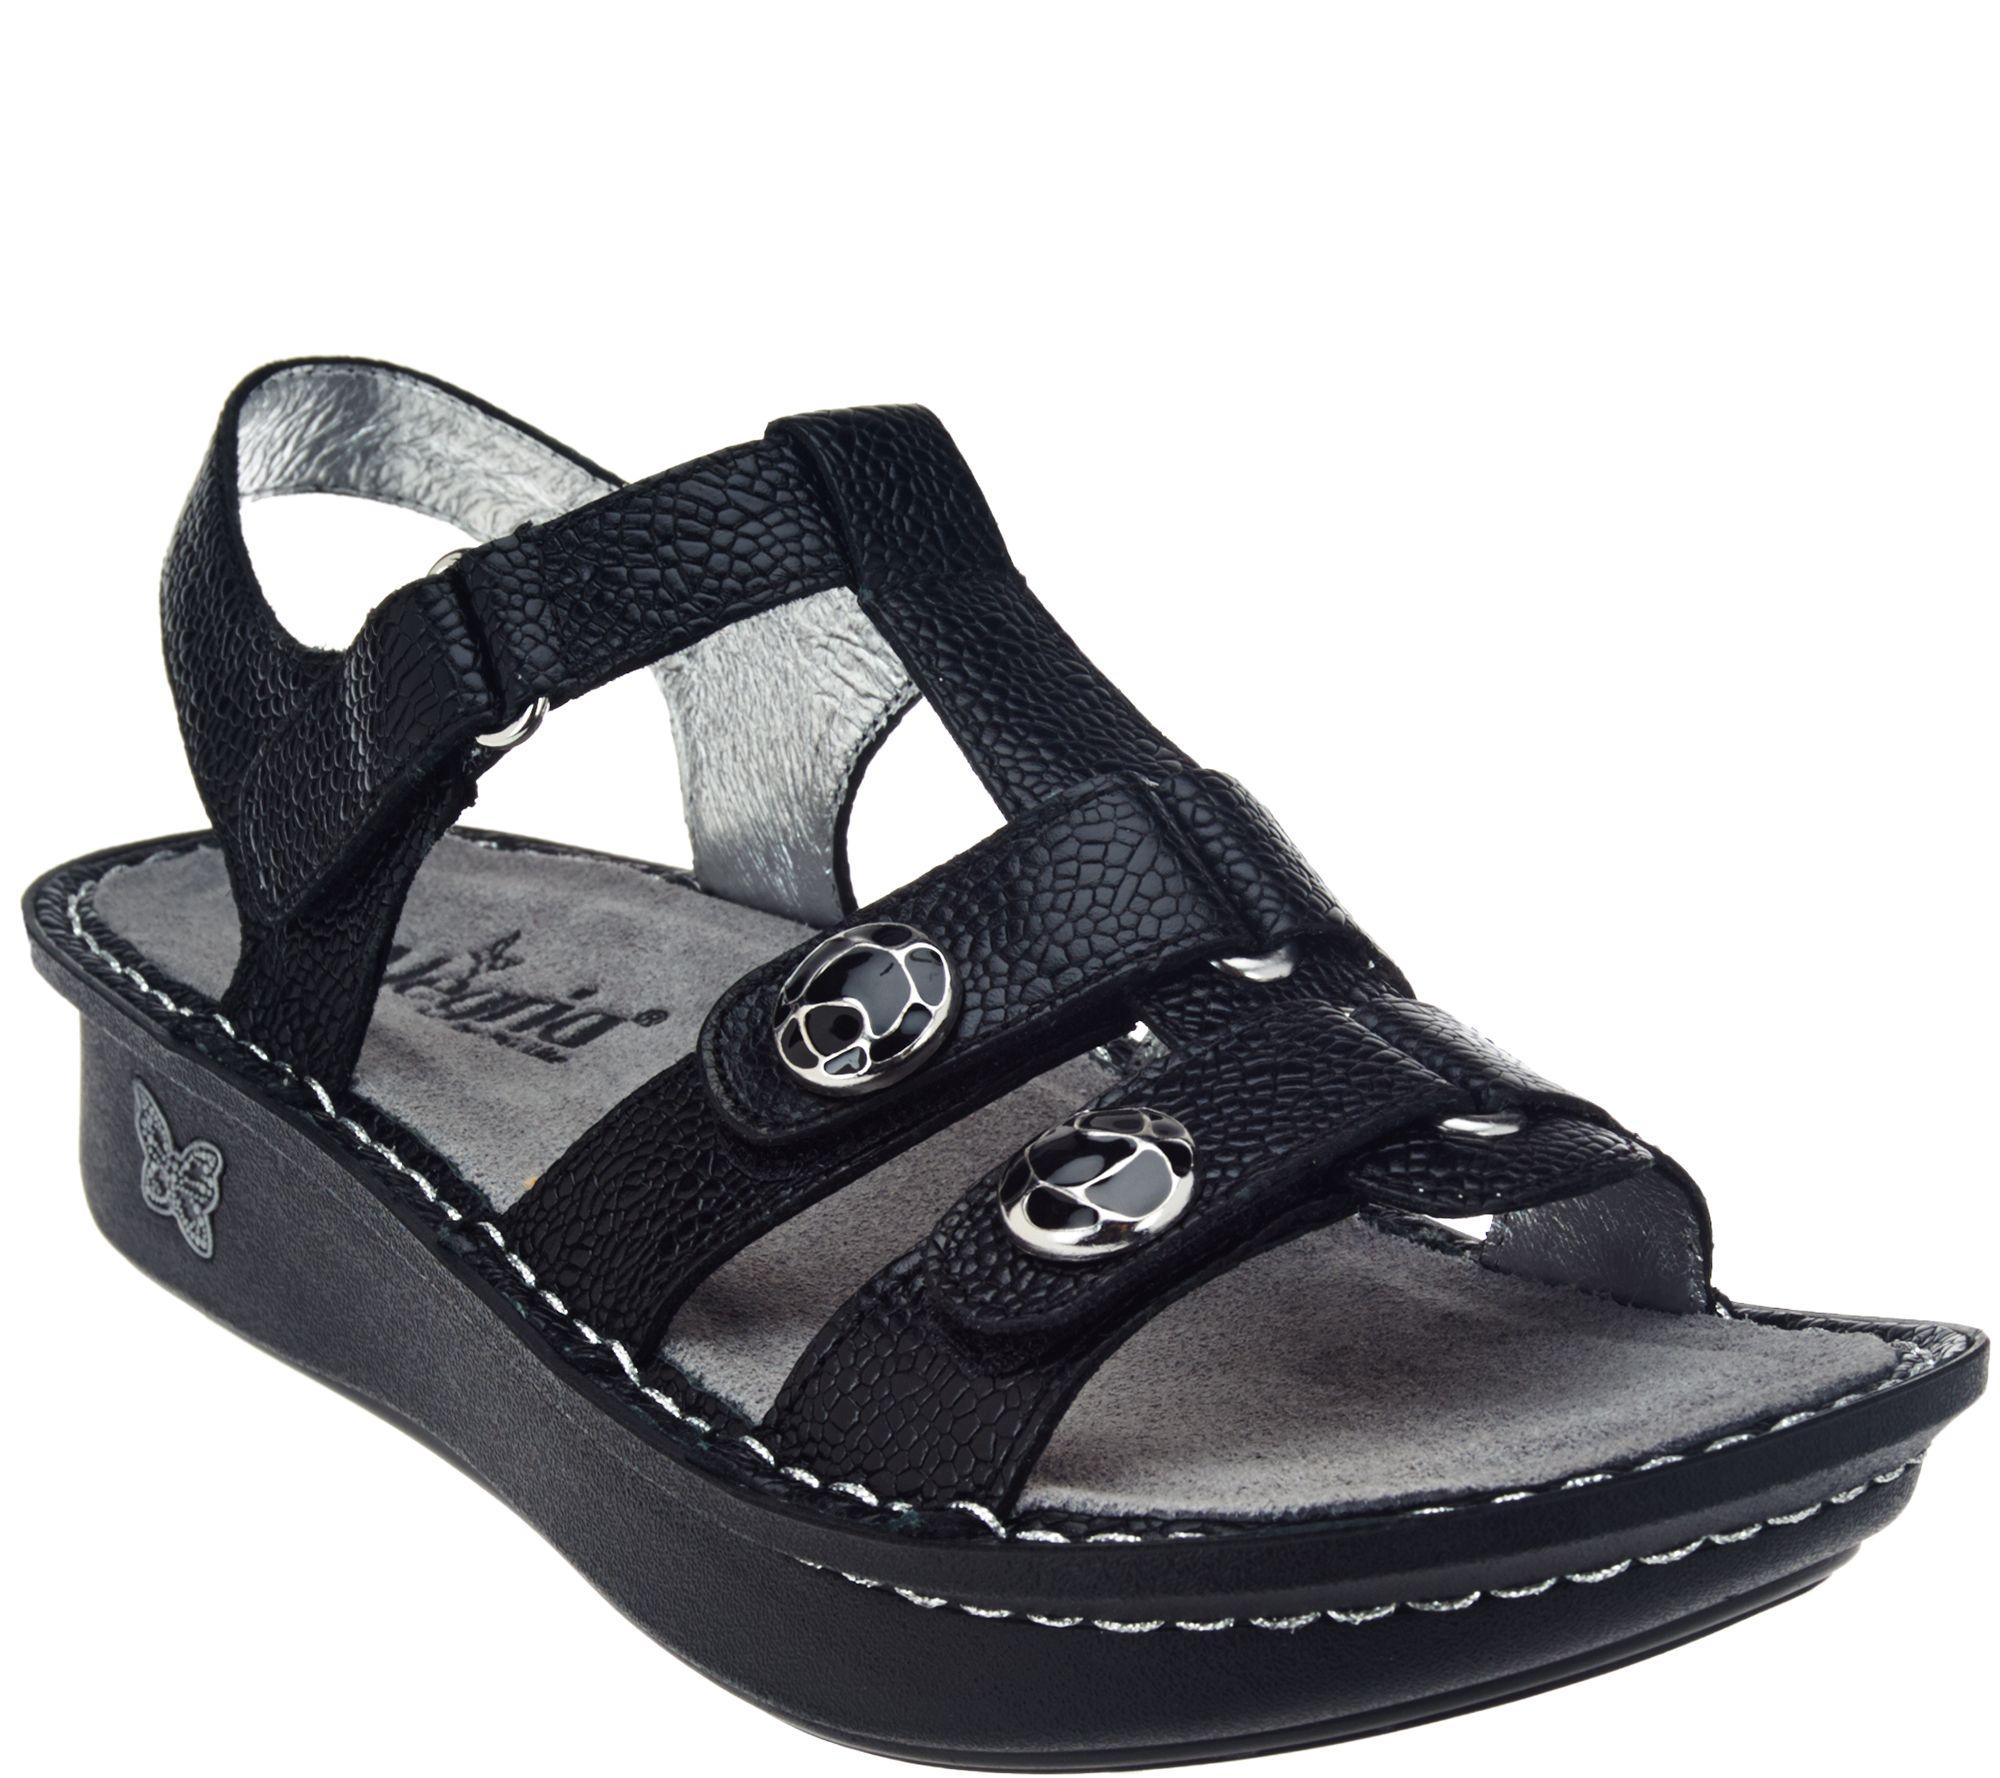 fca9af5a8 Alegria Leather Multi-Strap Sandals w  Backstrap - Kleo - Page 1 — QVC.com